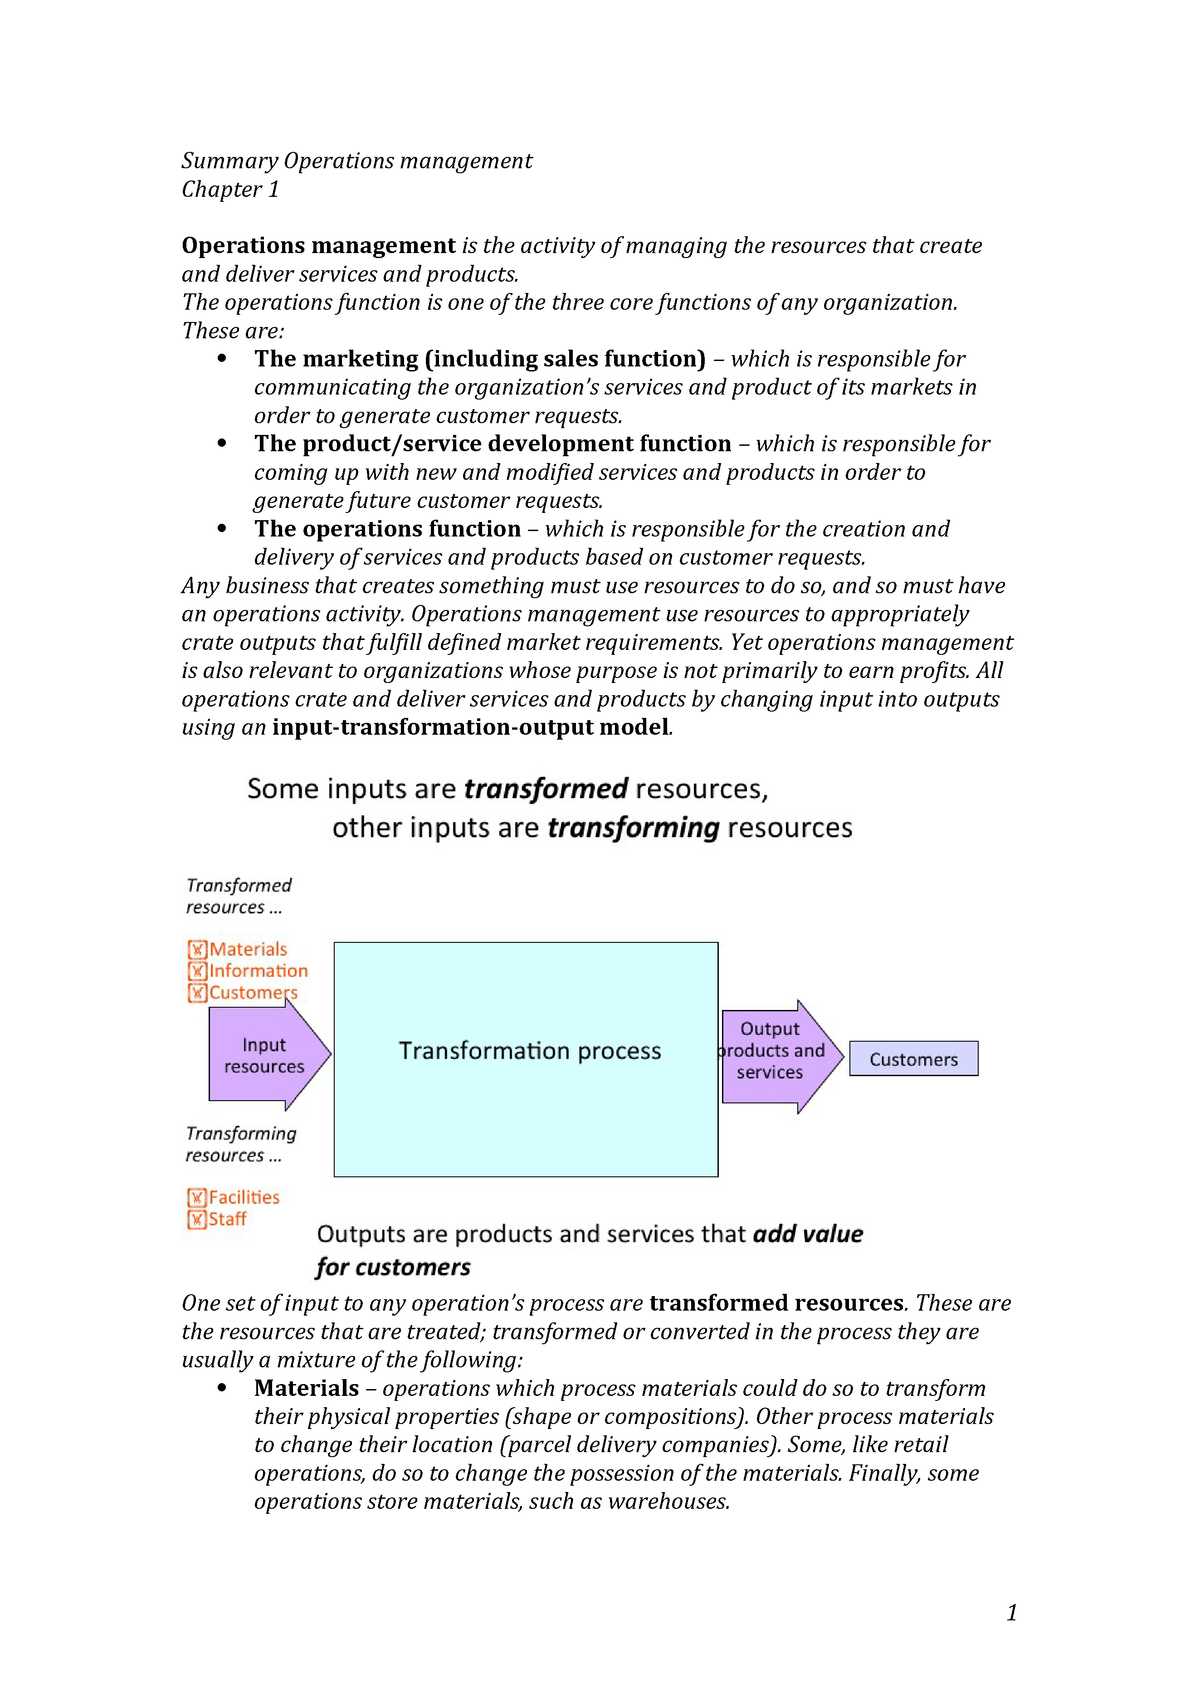 Summary Operations Management - Summary Chapter 1-19